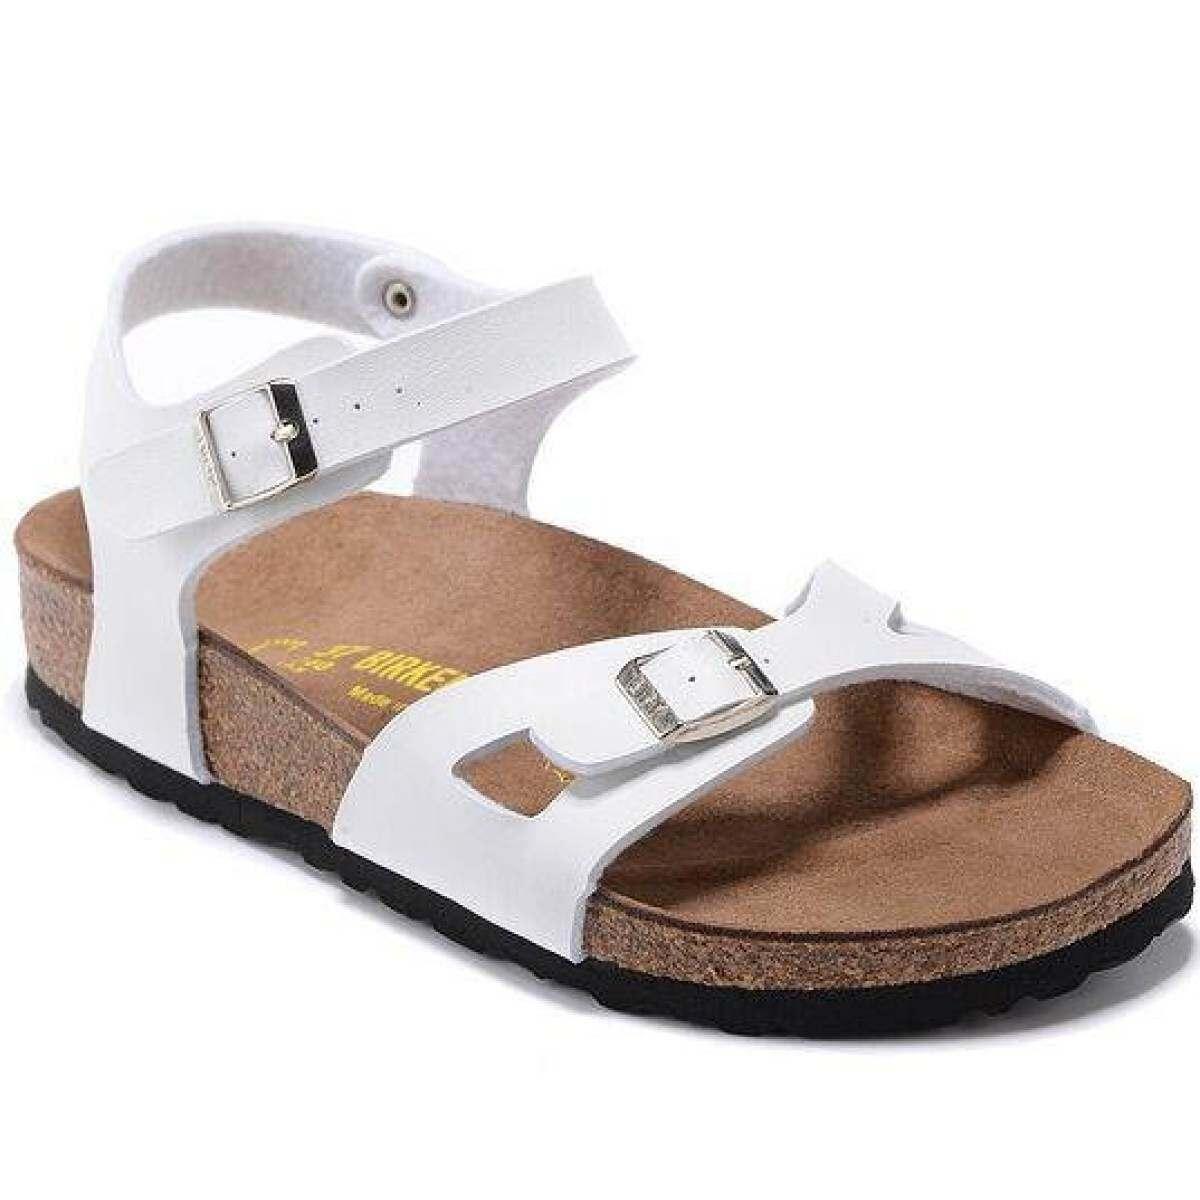 Birkenstock Ramses White Birko Flor Sandal Pria Putih Daftar Harga Whitelust Targaryen Casual Hitam 42 Womens Rio Flat Sandals Size 35 41